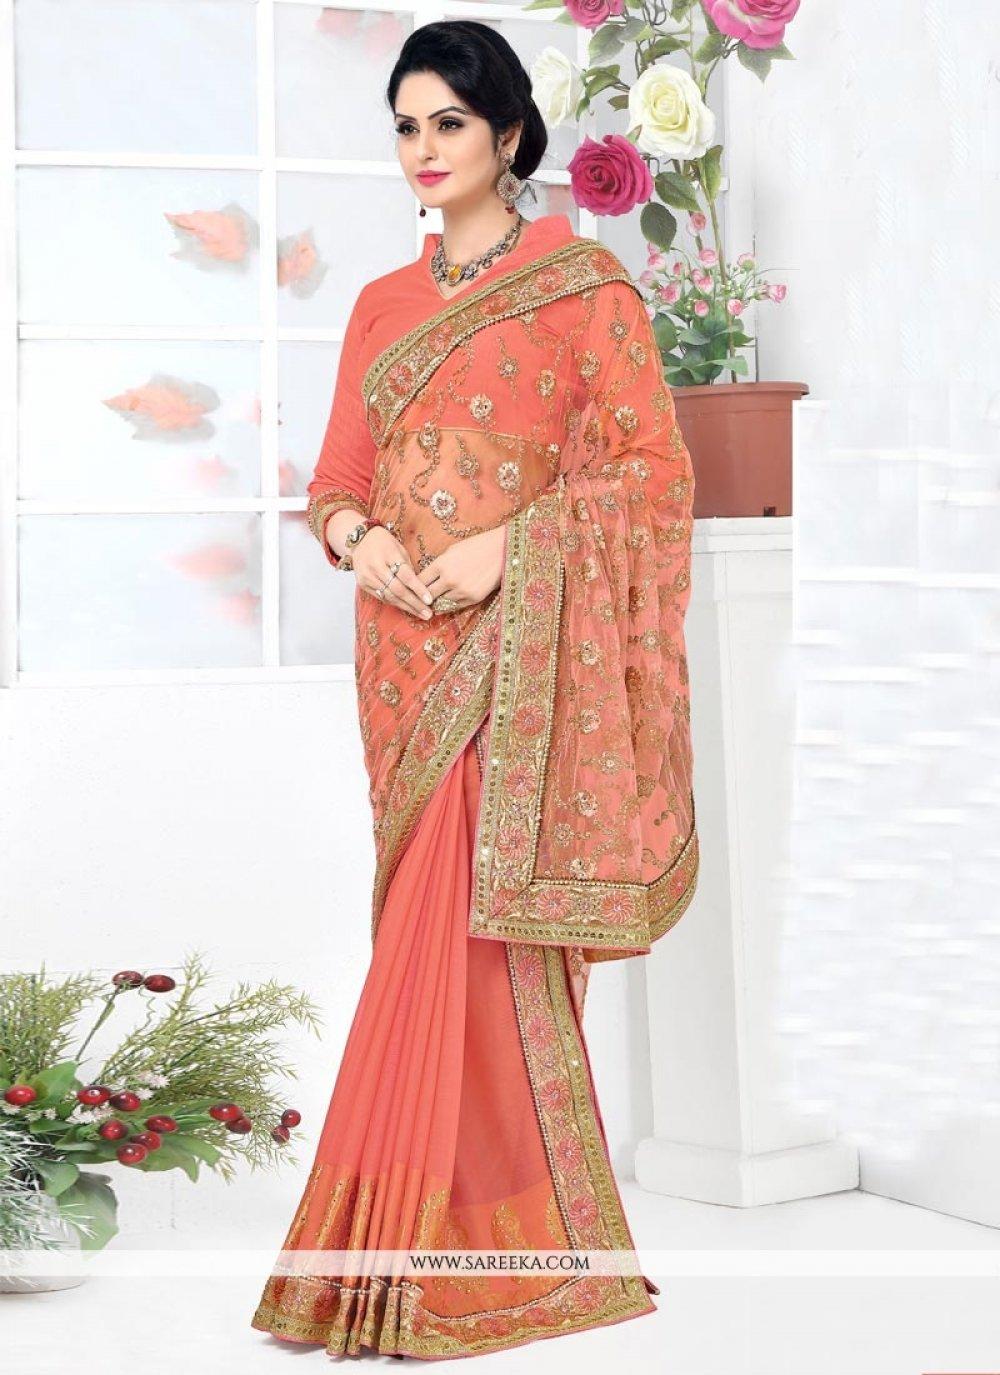 Banarasi Silk Orange Patch Border Work Lehenga Saree